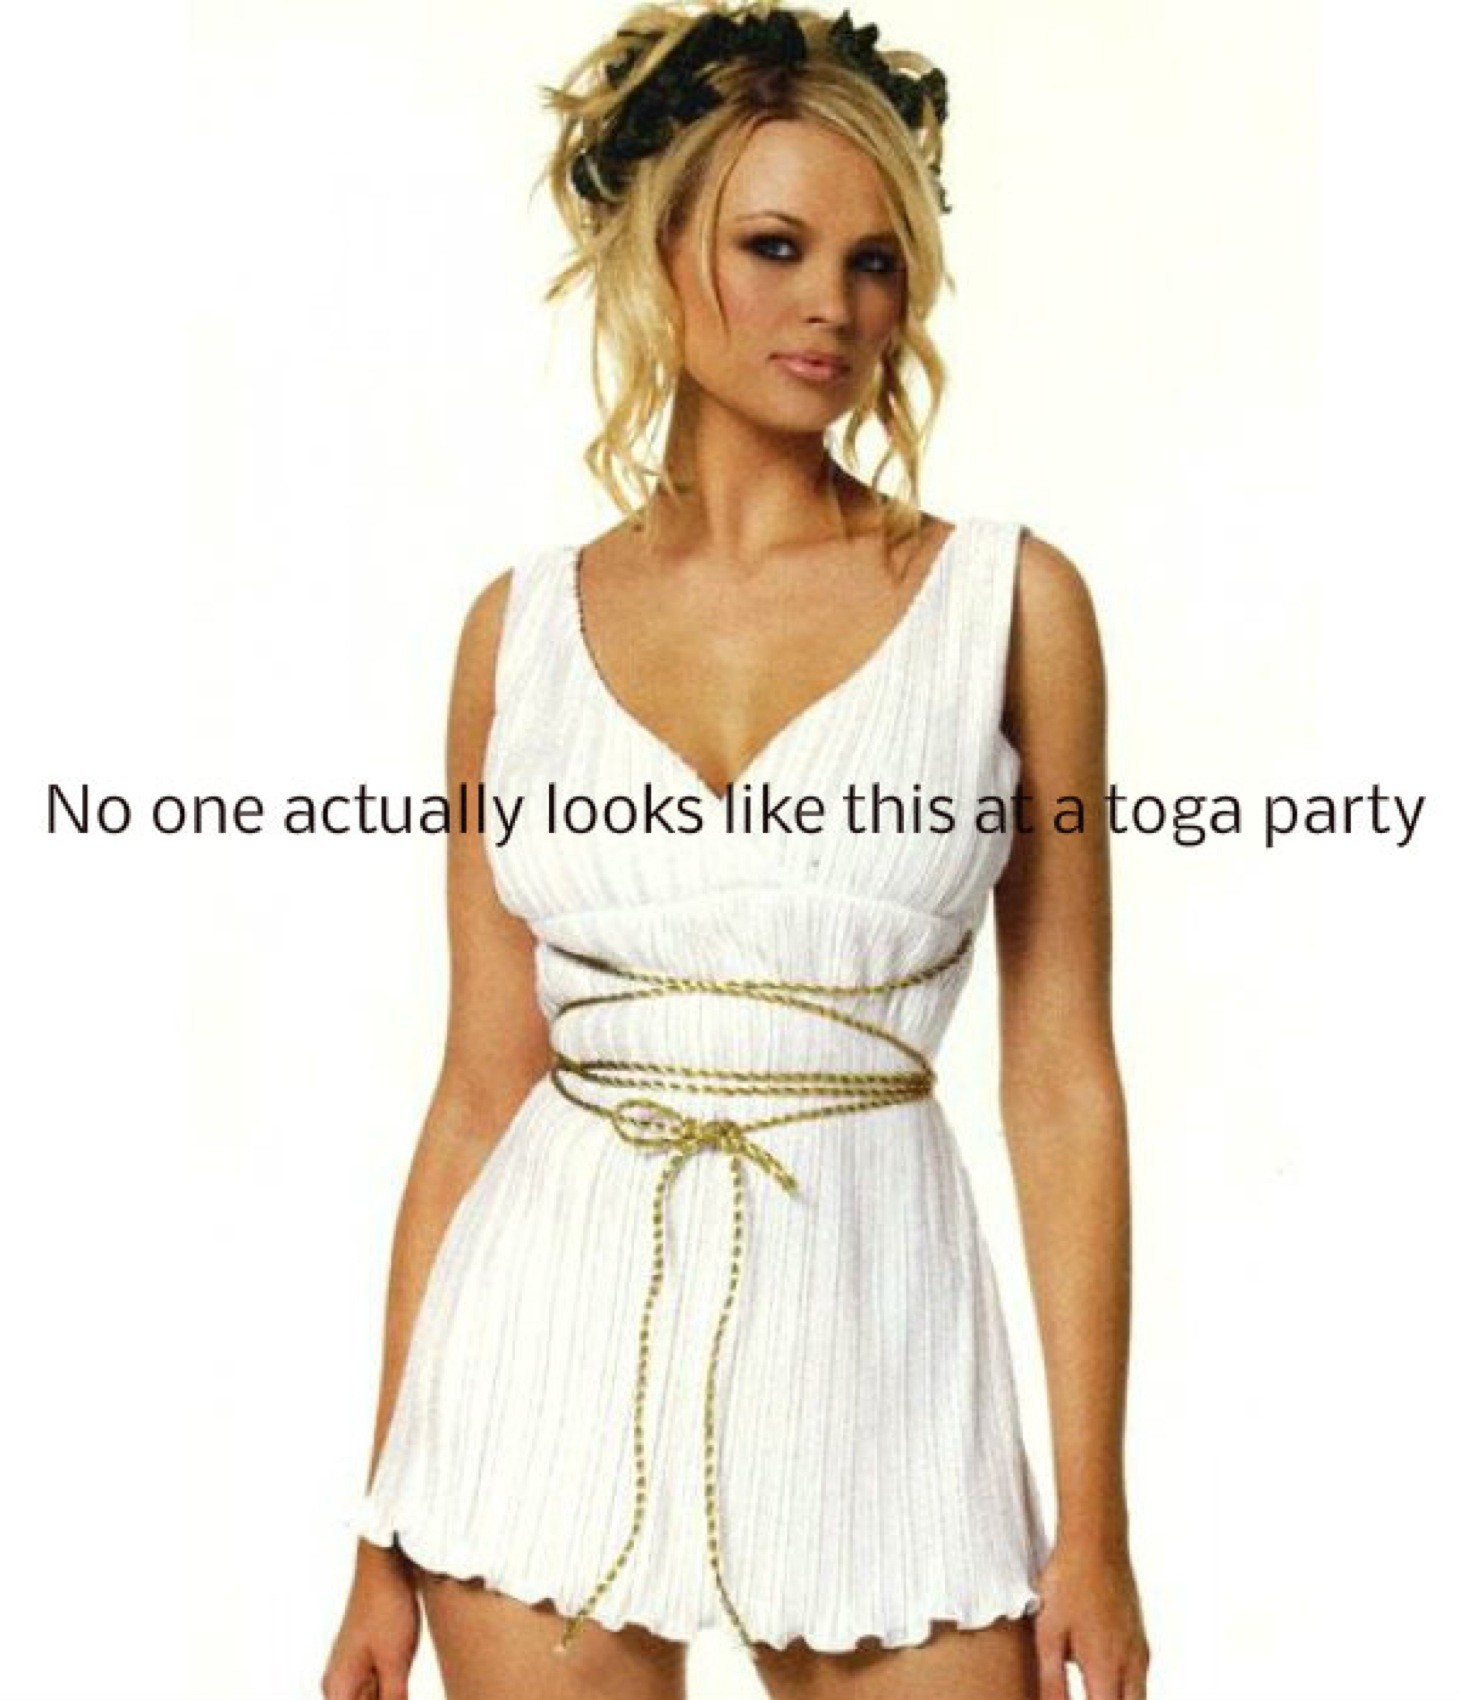 wpid-Costume-dea-per-Toga-Party.jpg